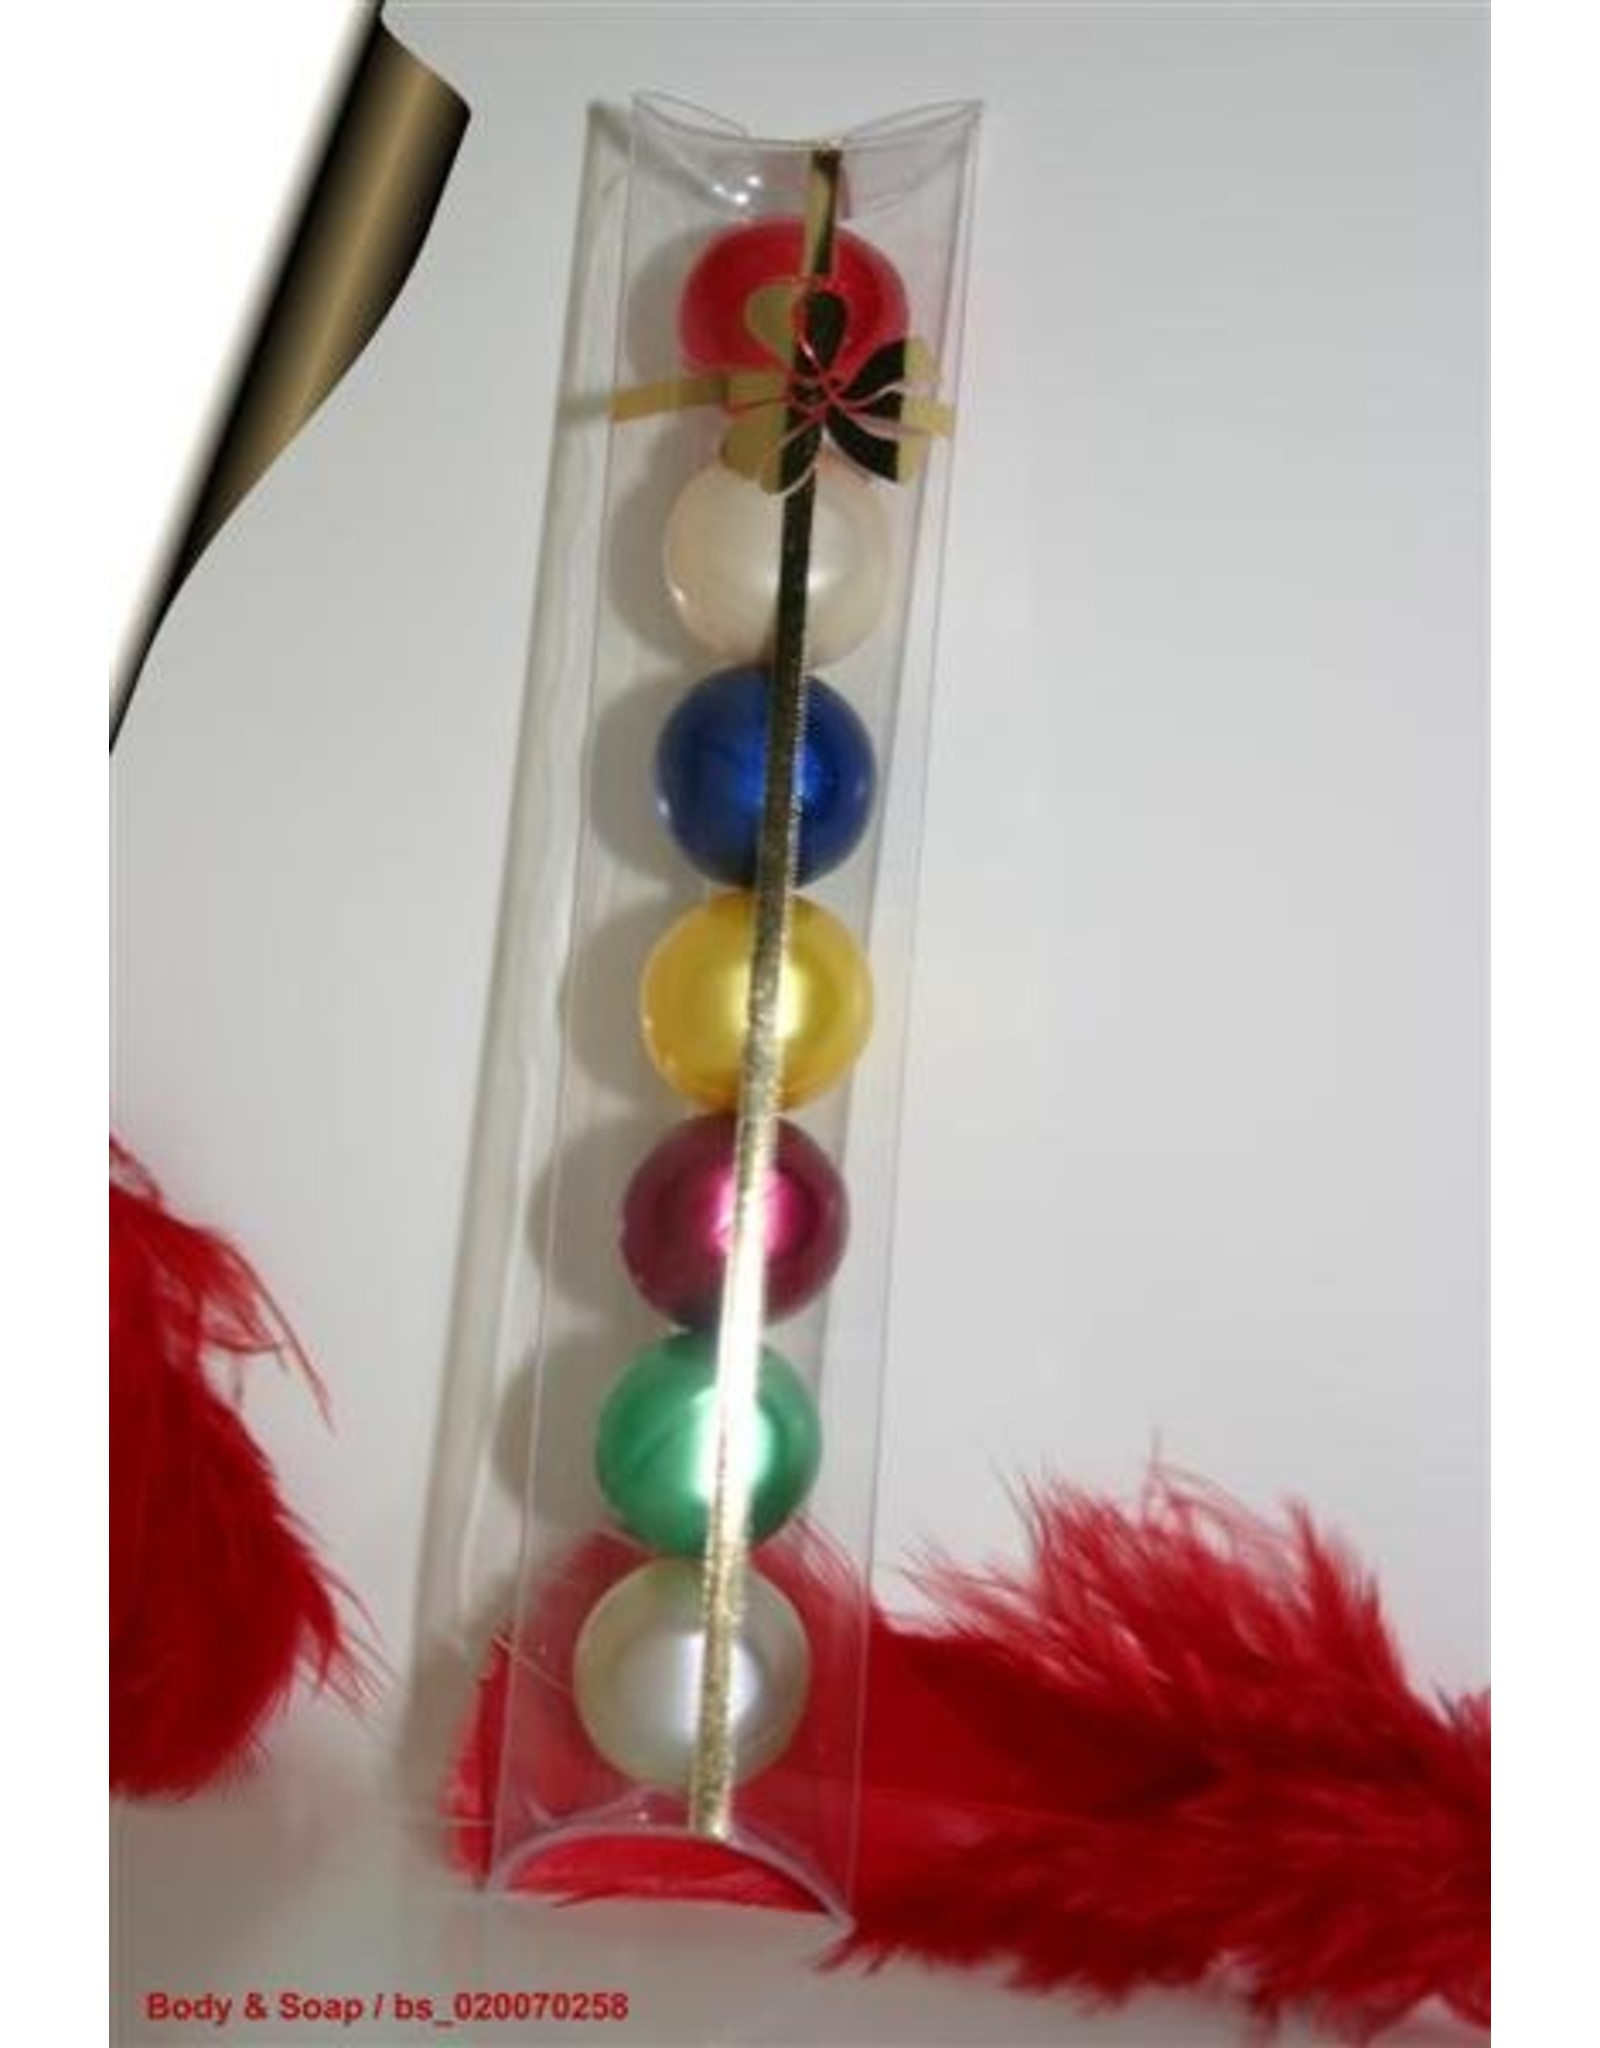 Badparels (rond) in geschenketui - Body & Soap